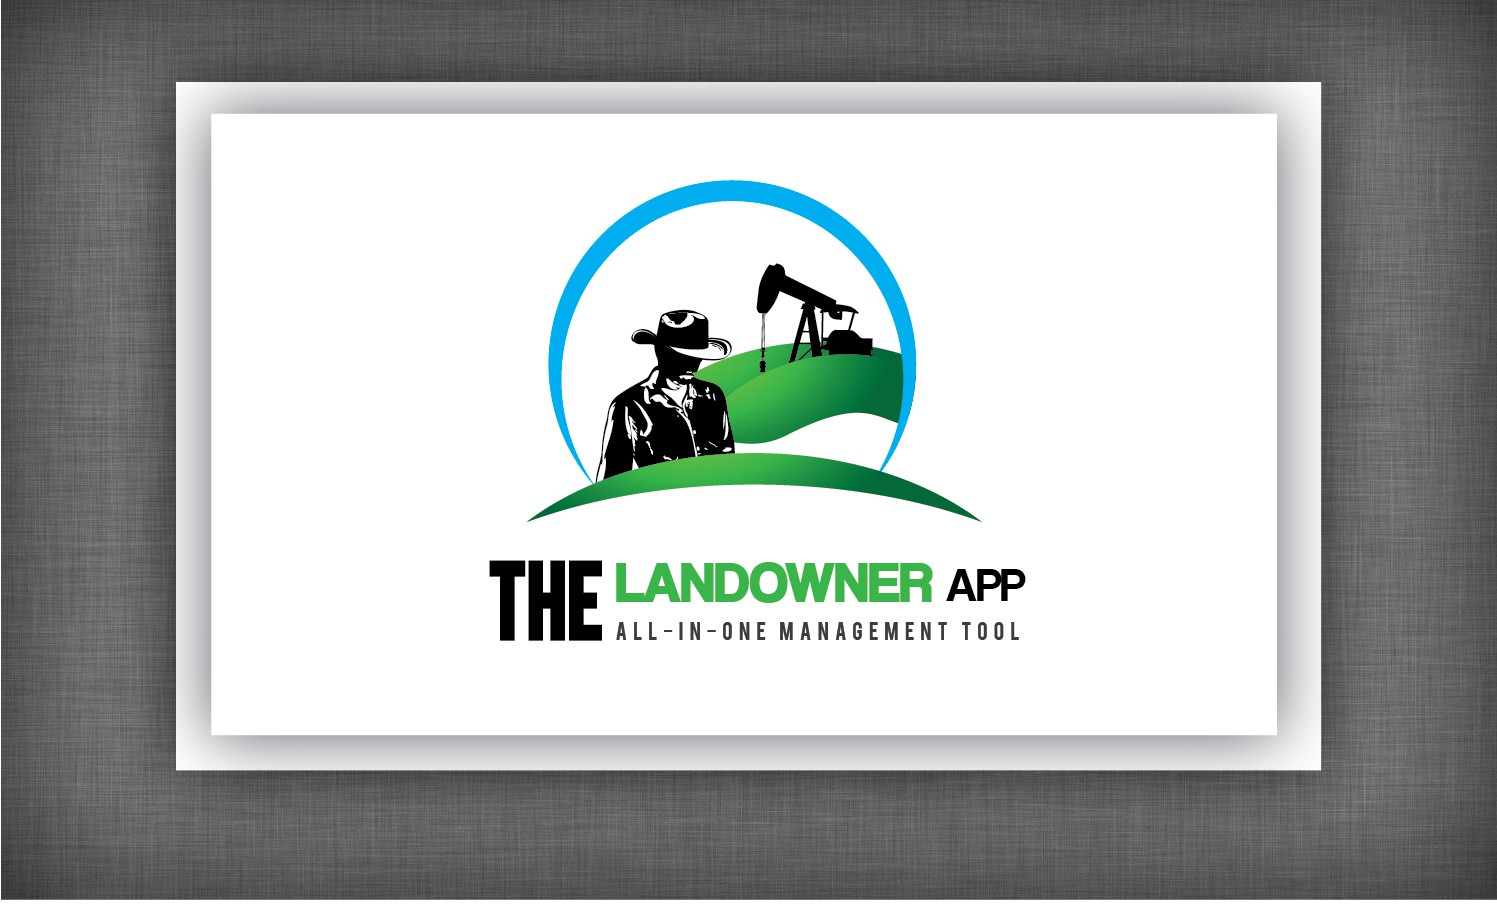 Create the next logo for The Landowner App